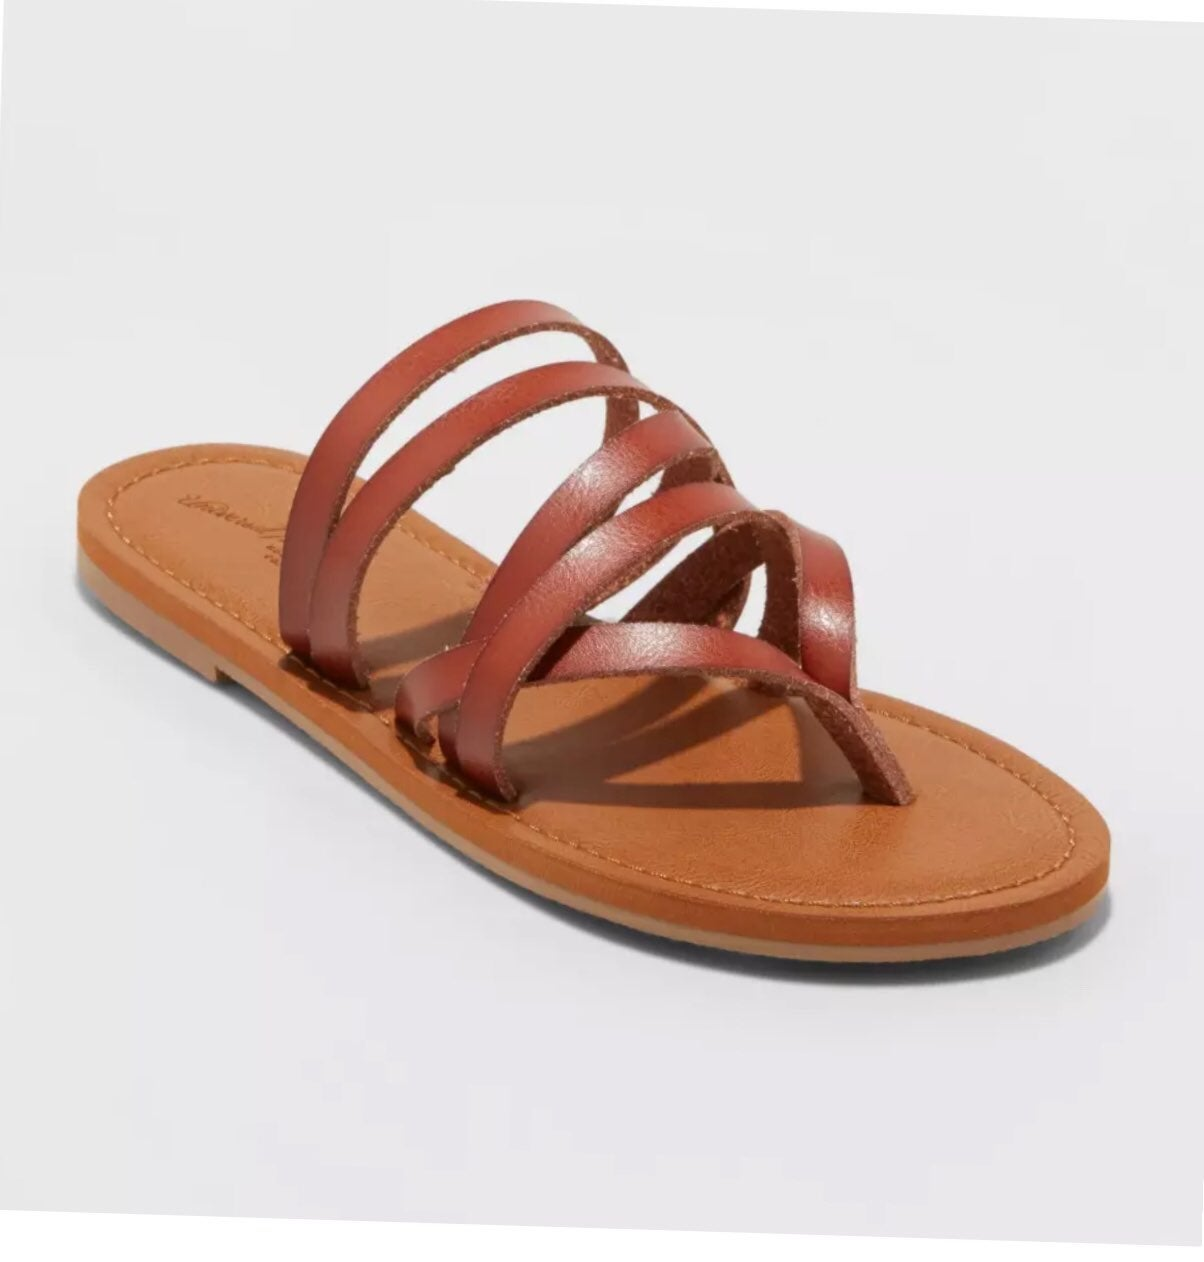 Maritza Multi Strap Toe Slide Sandal~New